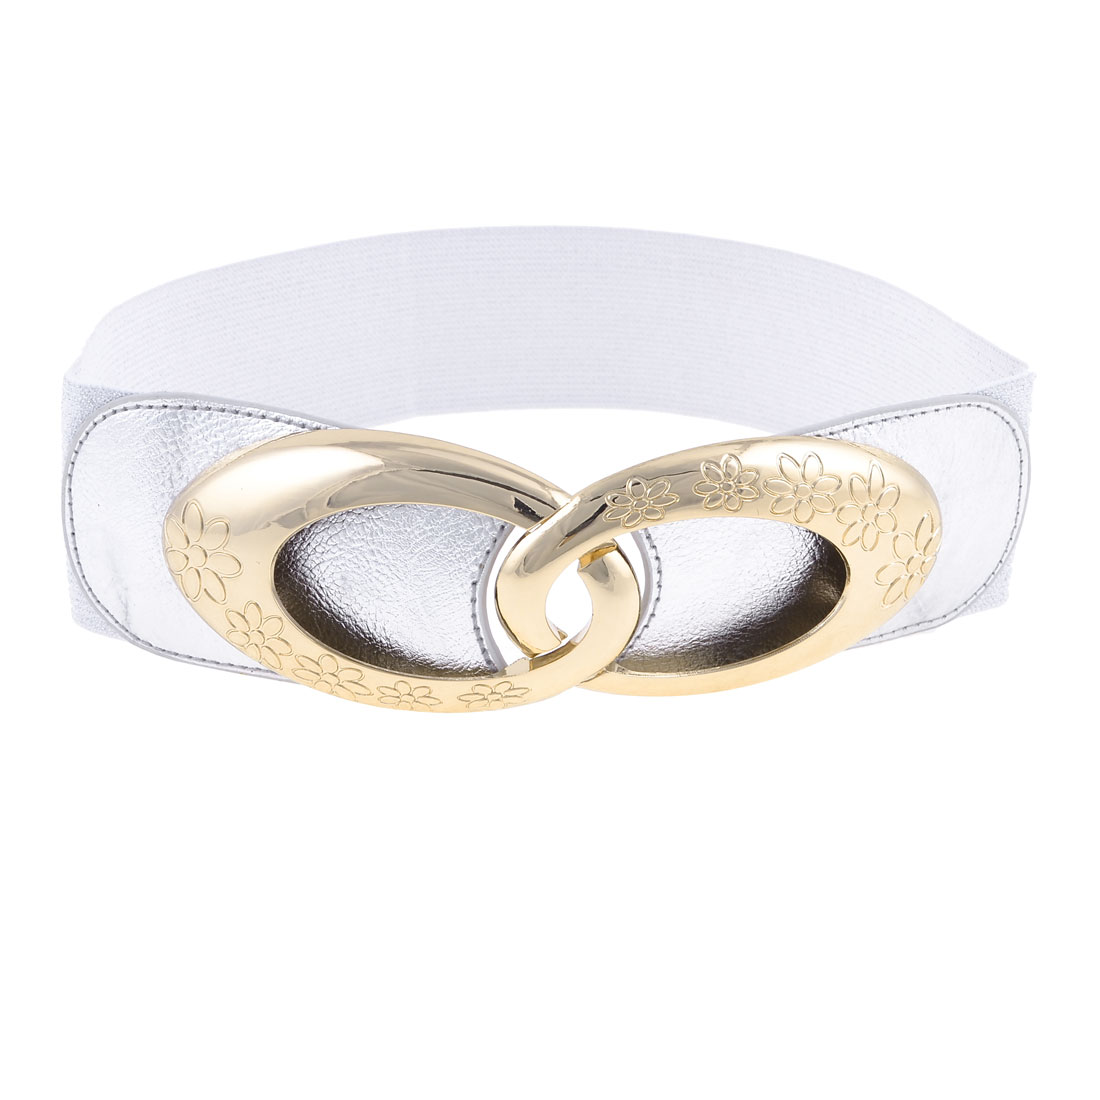 Lady Gold Tone Plastic Interlocking Buckle Black Elastic Waistband Belt Silver Tone